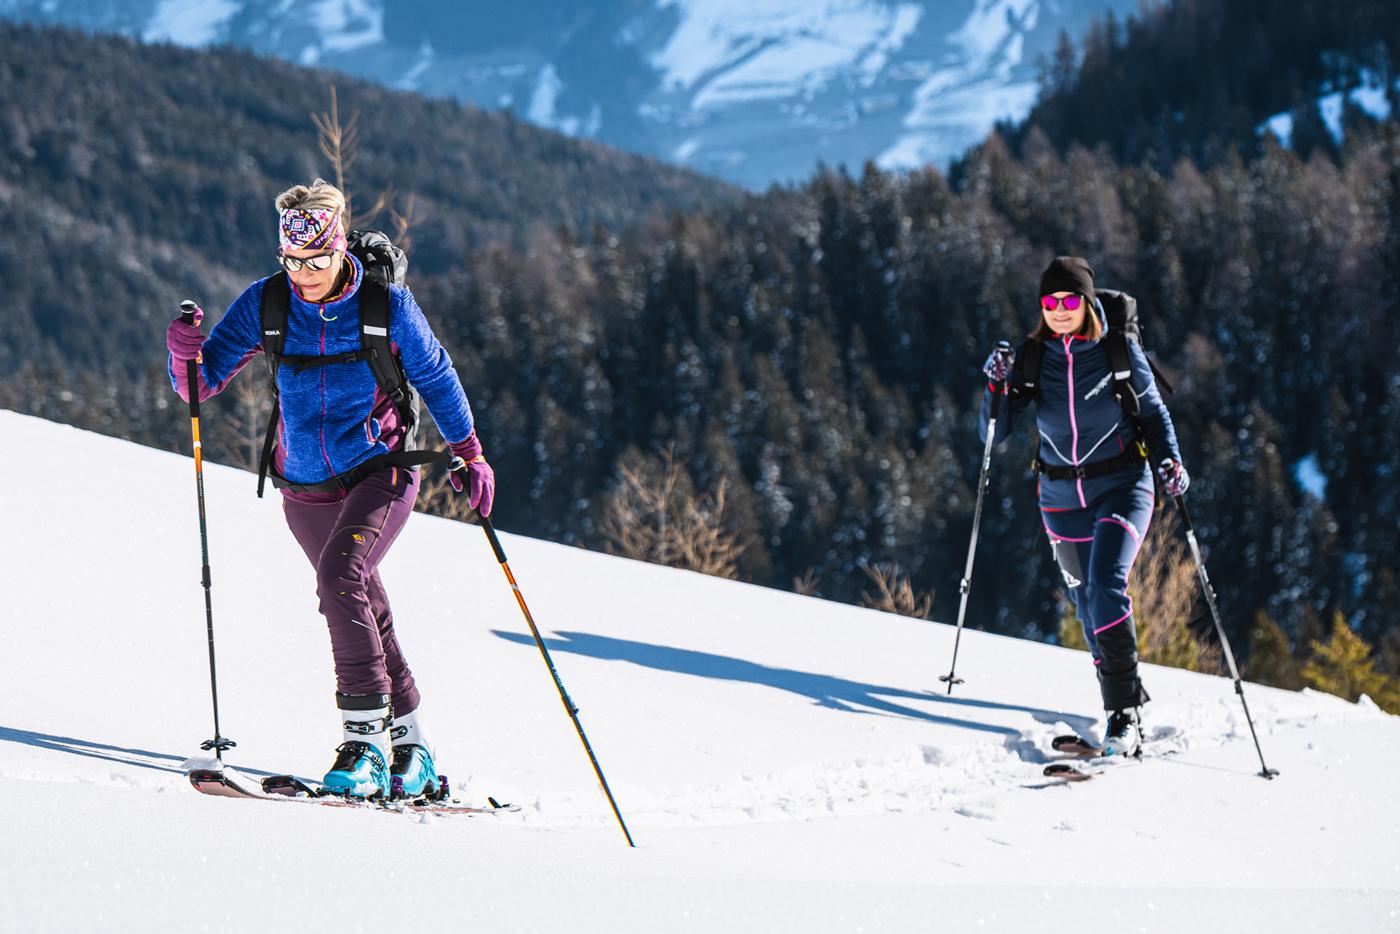 Kohla Tirol - Qualitt aus Tradition & Leidenschaft   Kohla